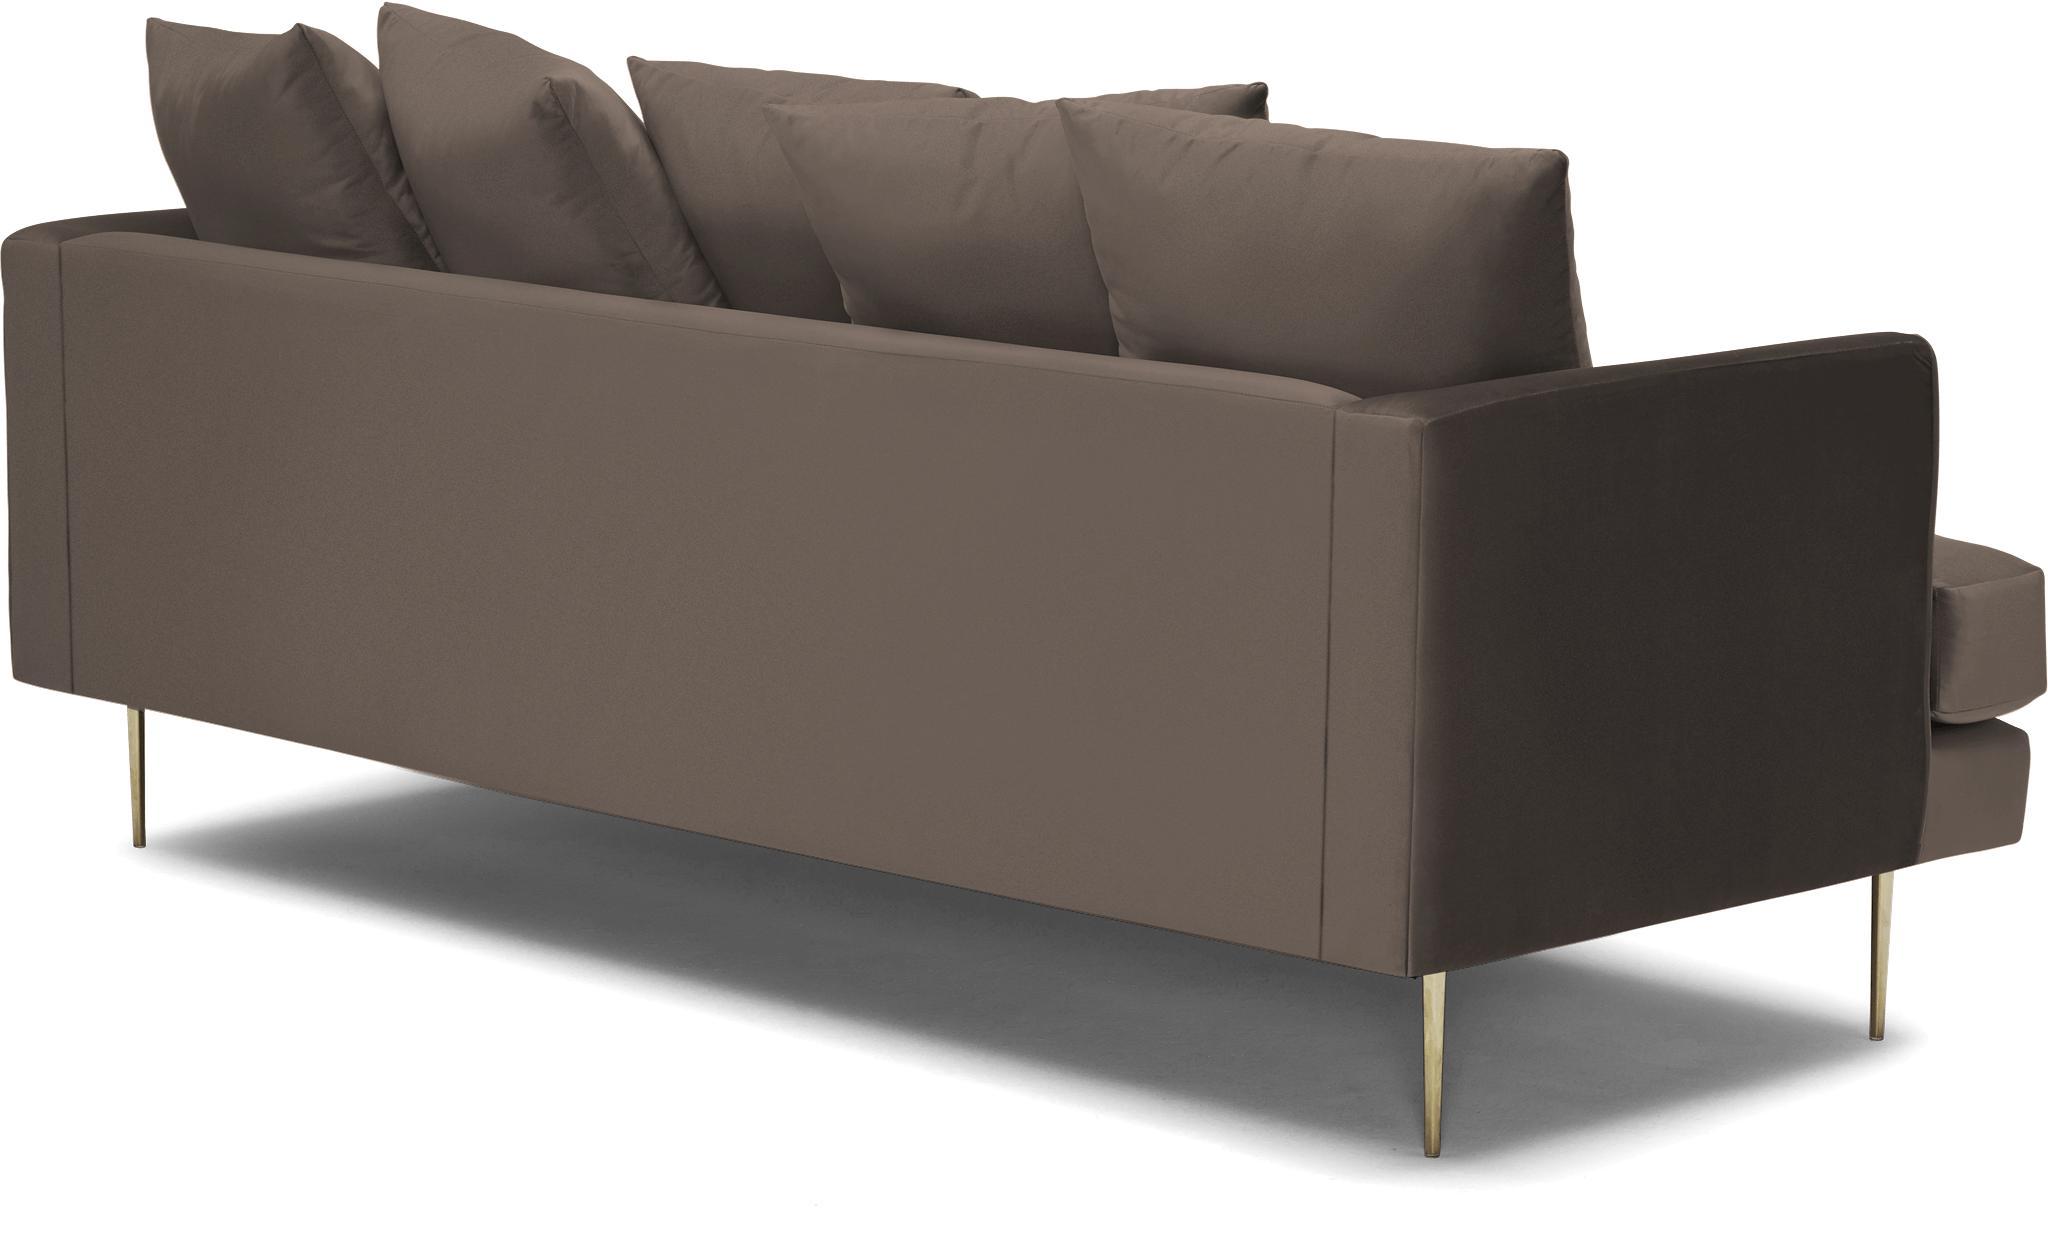 Brown Aime Mid Century Modern Sofa - Dawson Brindle